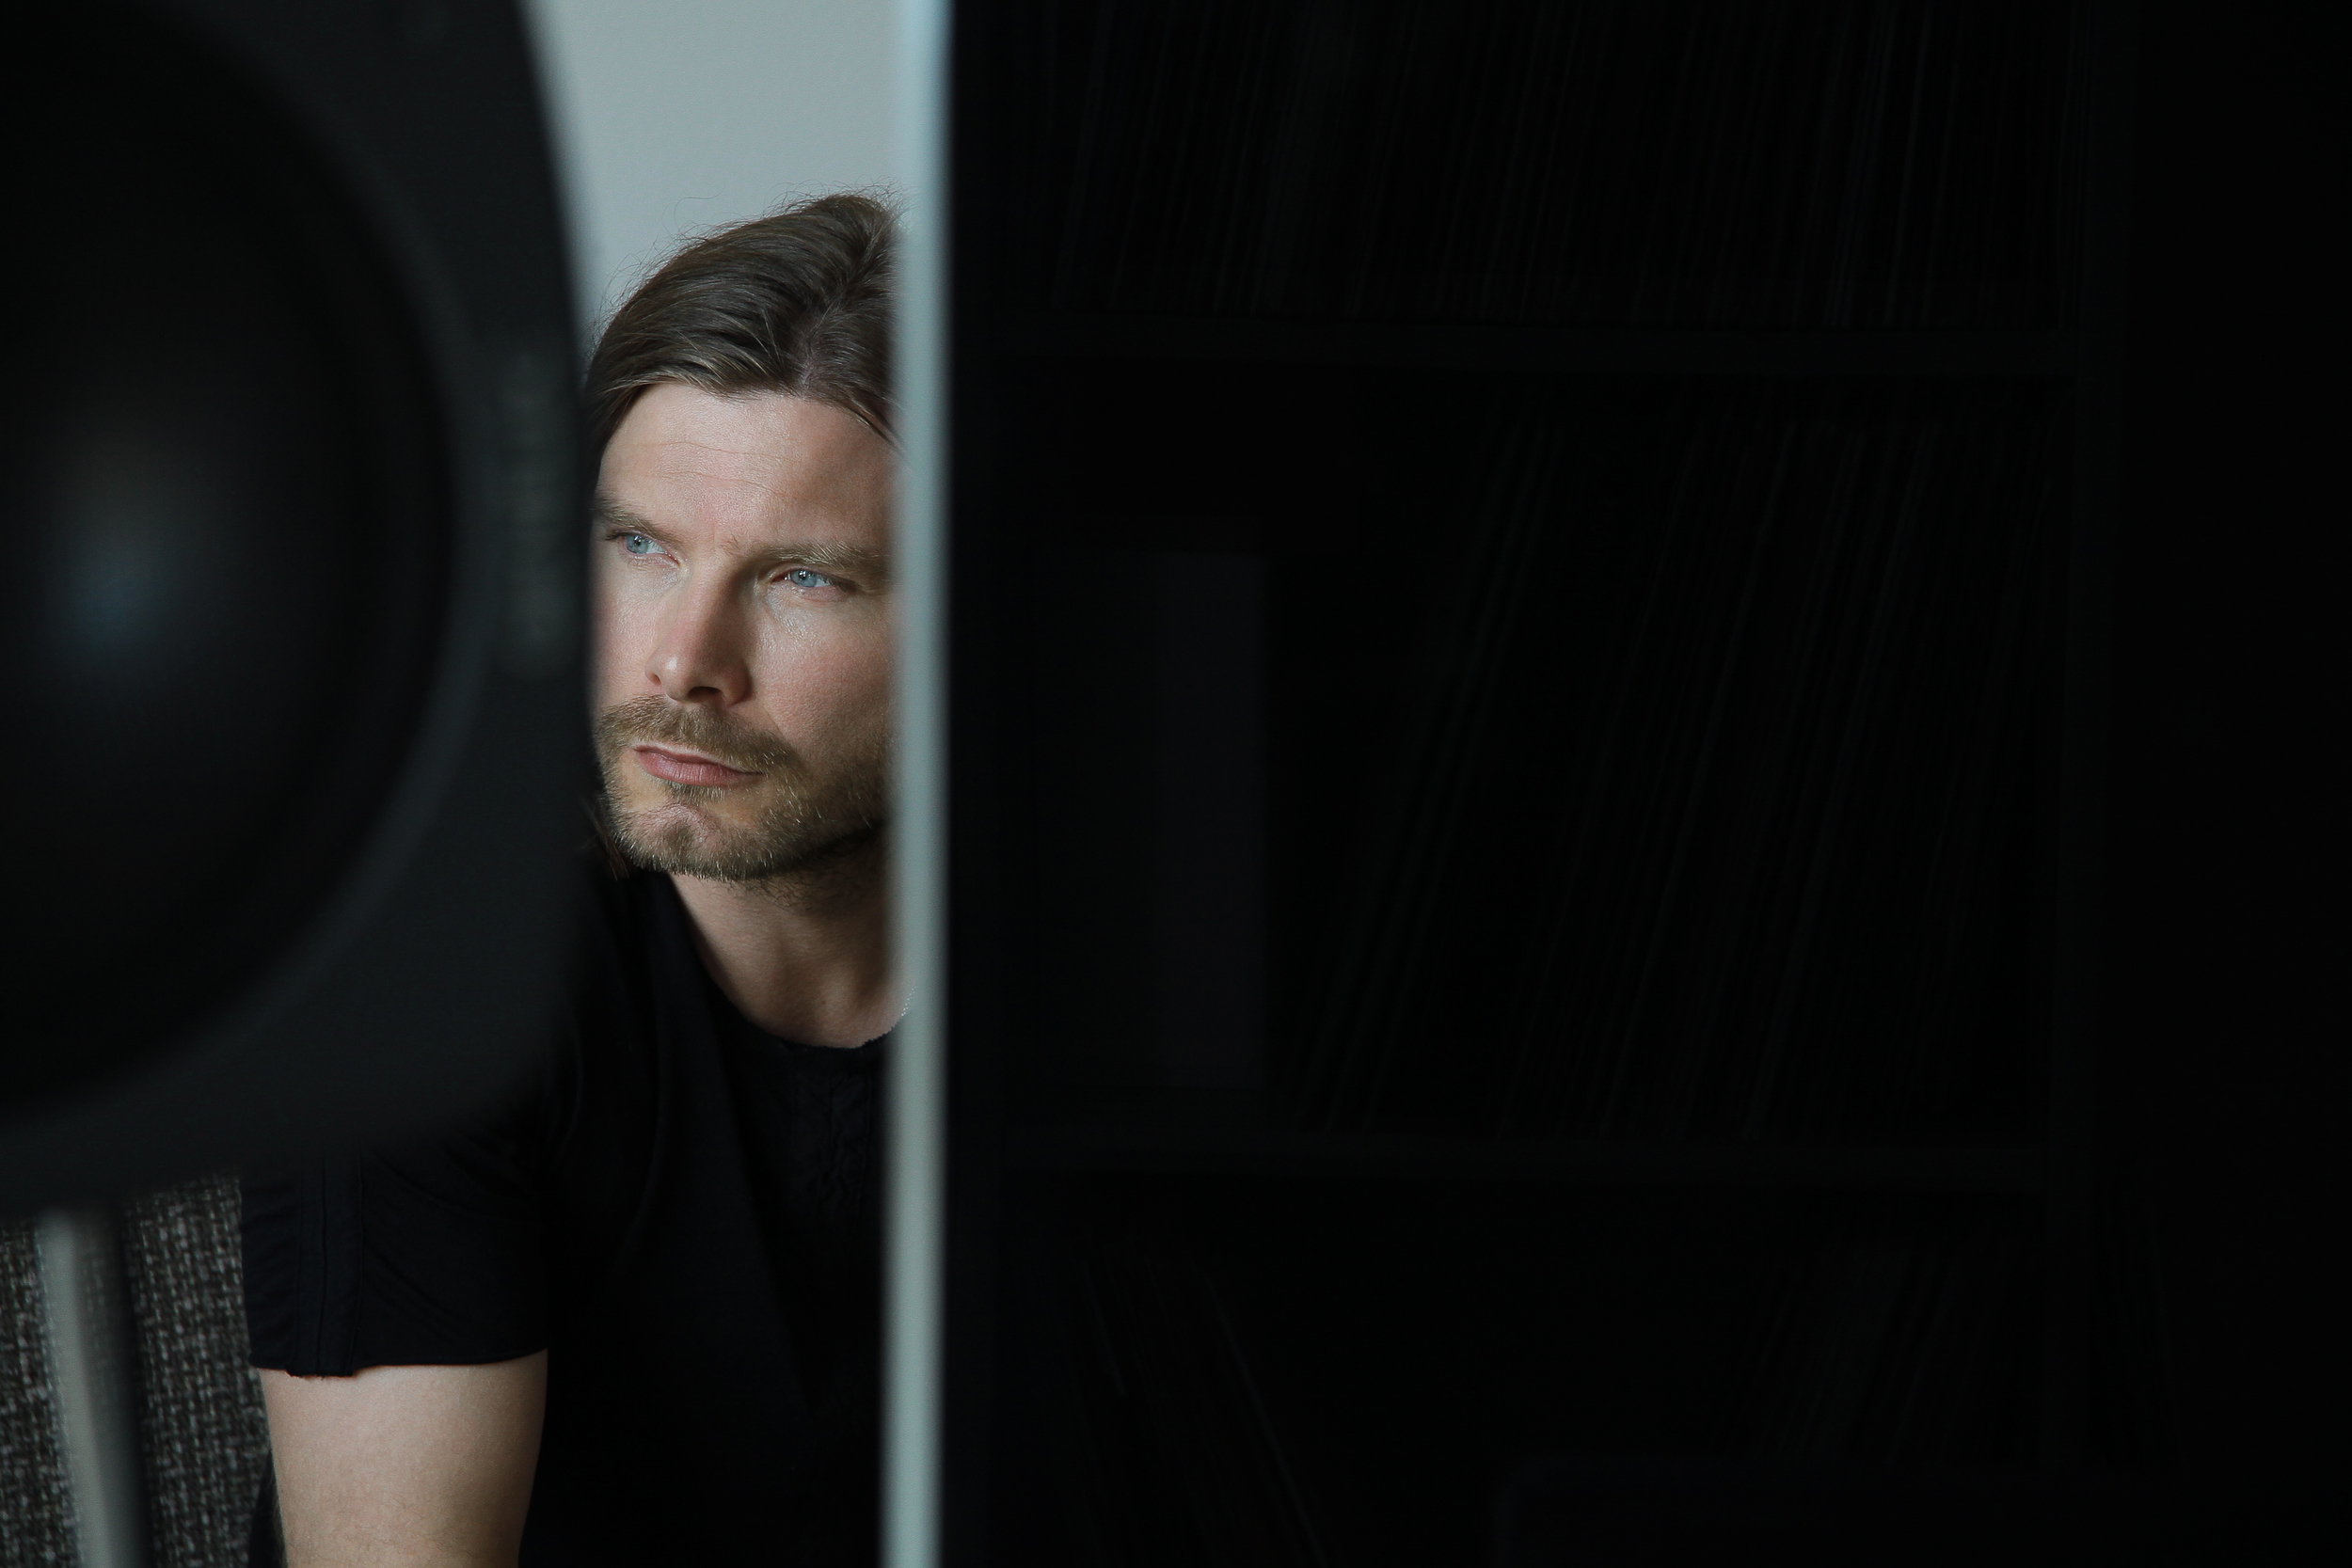 Marcel Dettmann / post-production: Florian Hetz